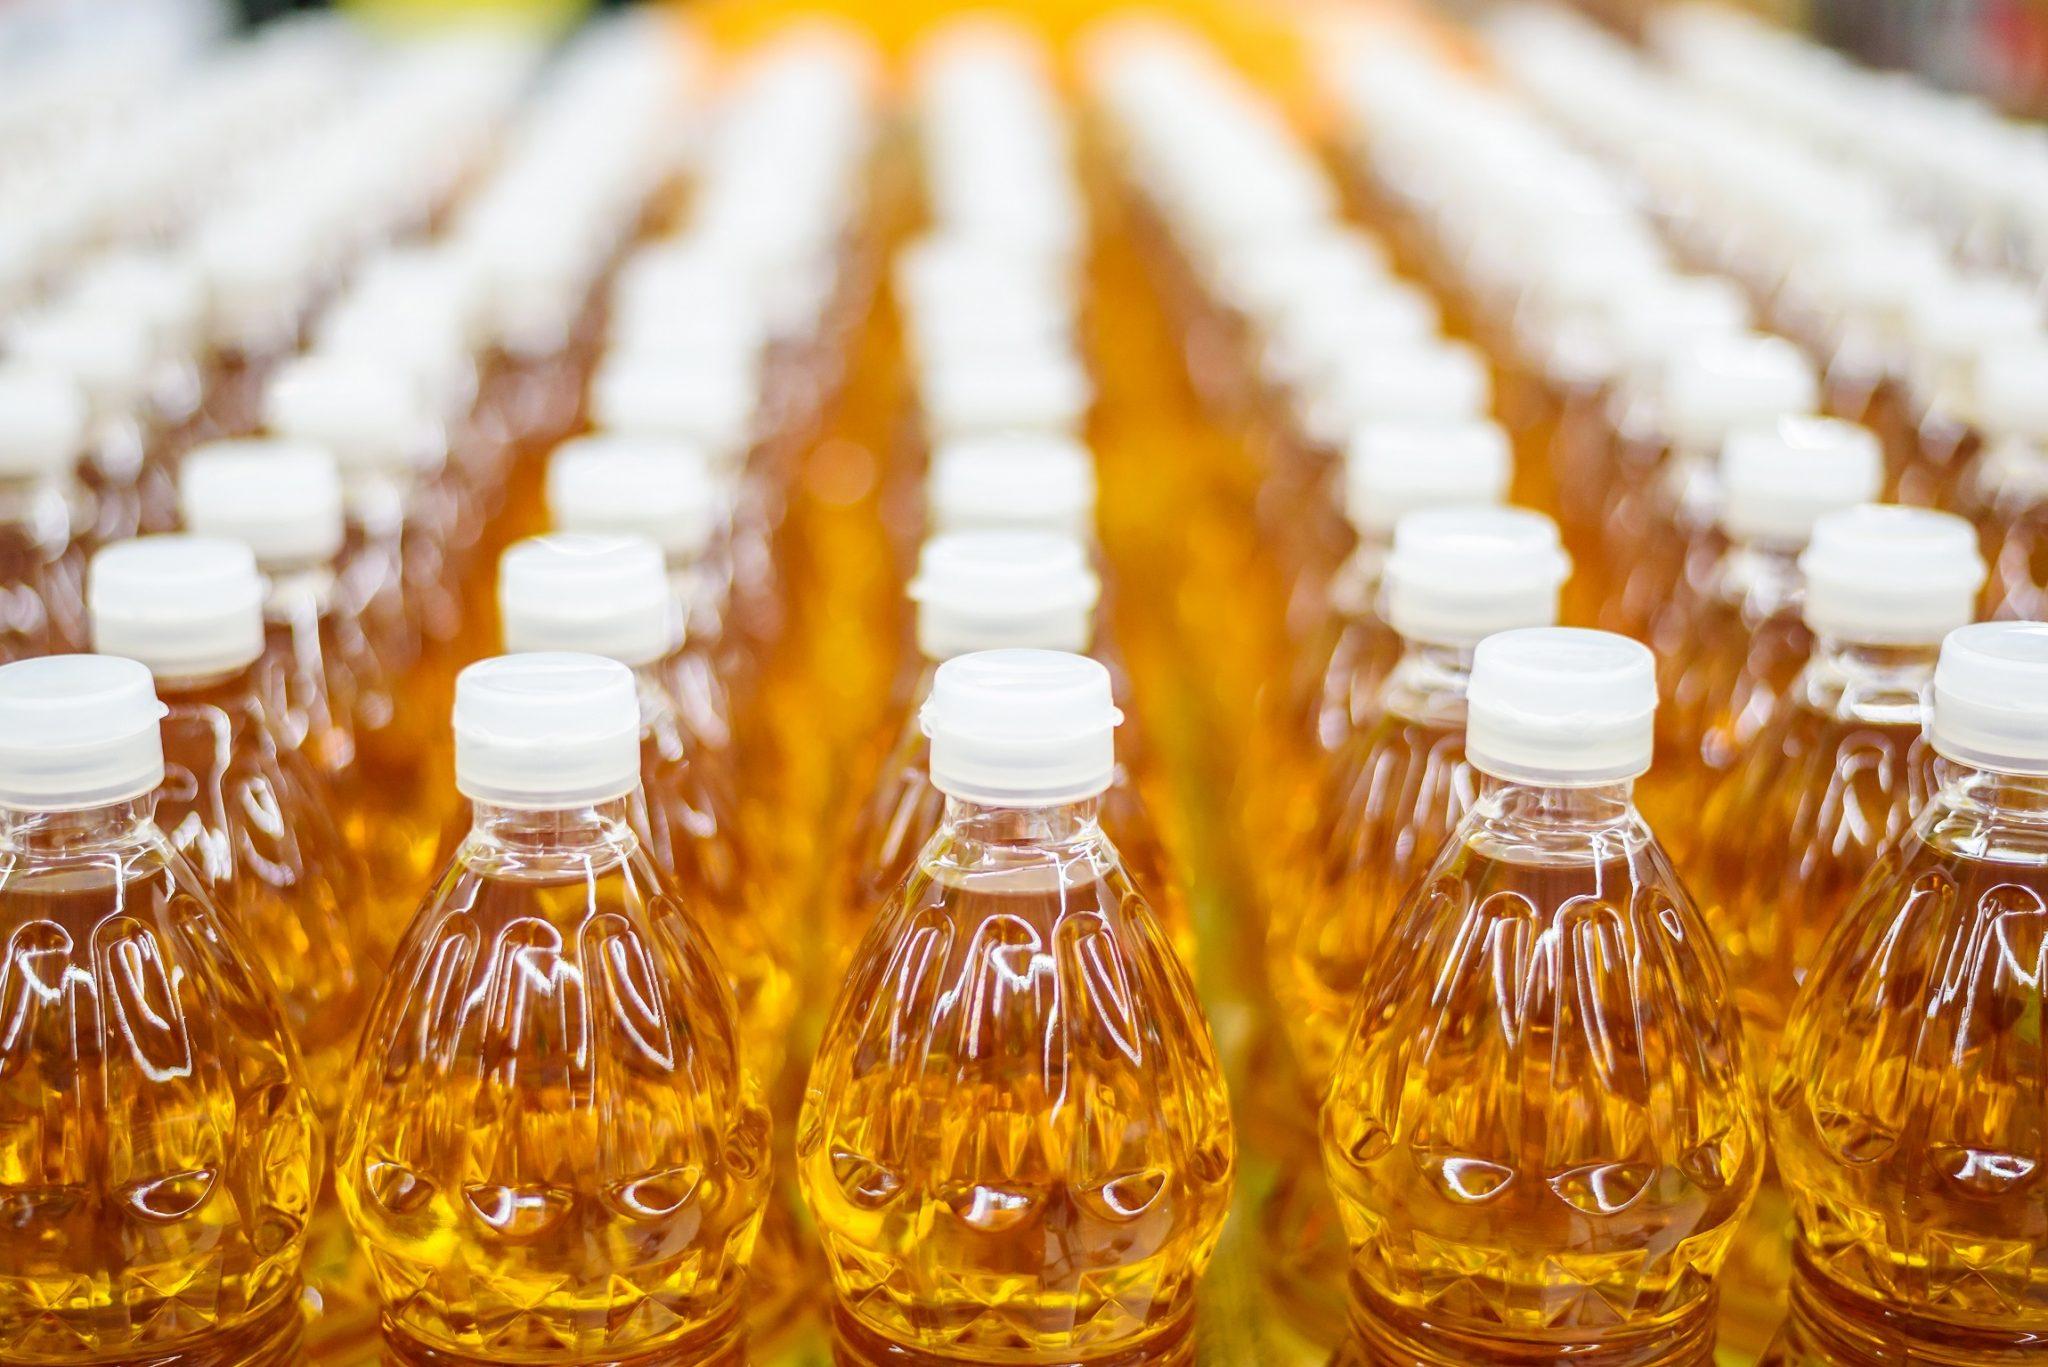 The level of exports of Ukrainian sunflower oil decreased